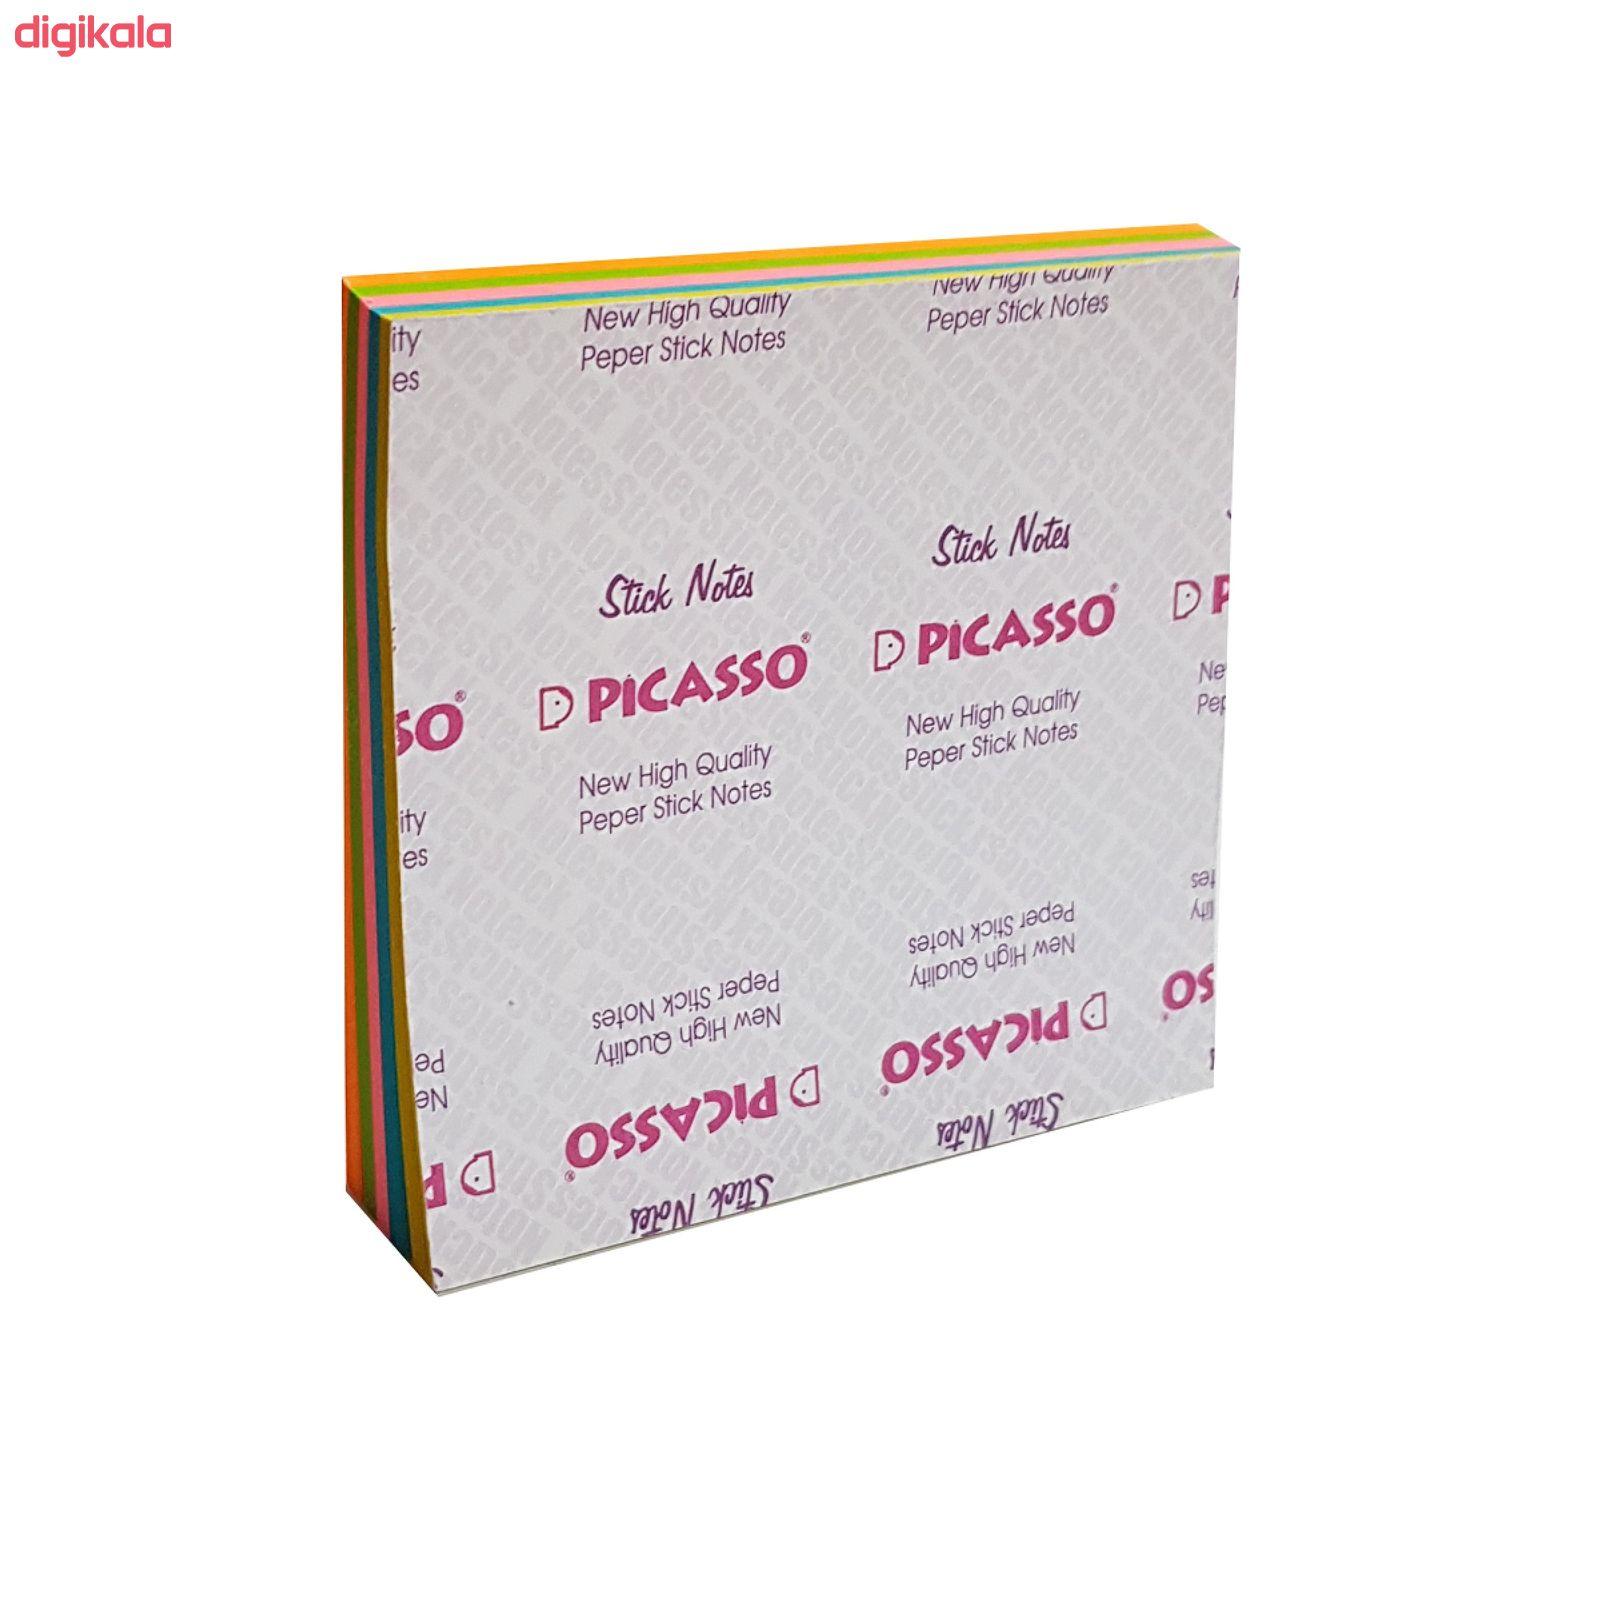 کاغذ یادداشت چسب دار پیکاسو مدل 75 main 1 2